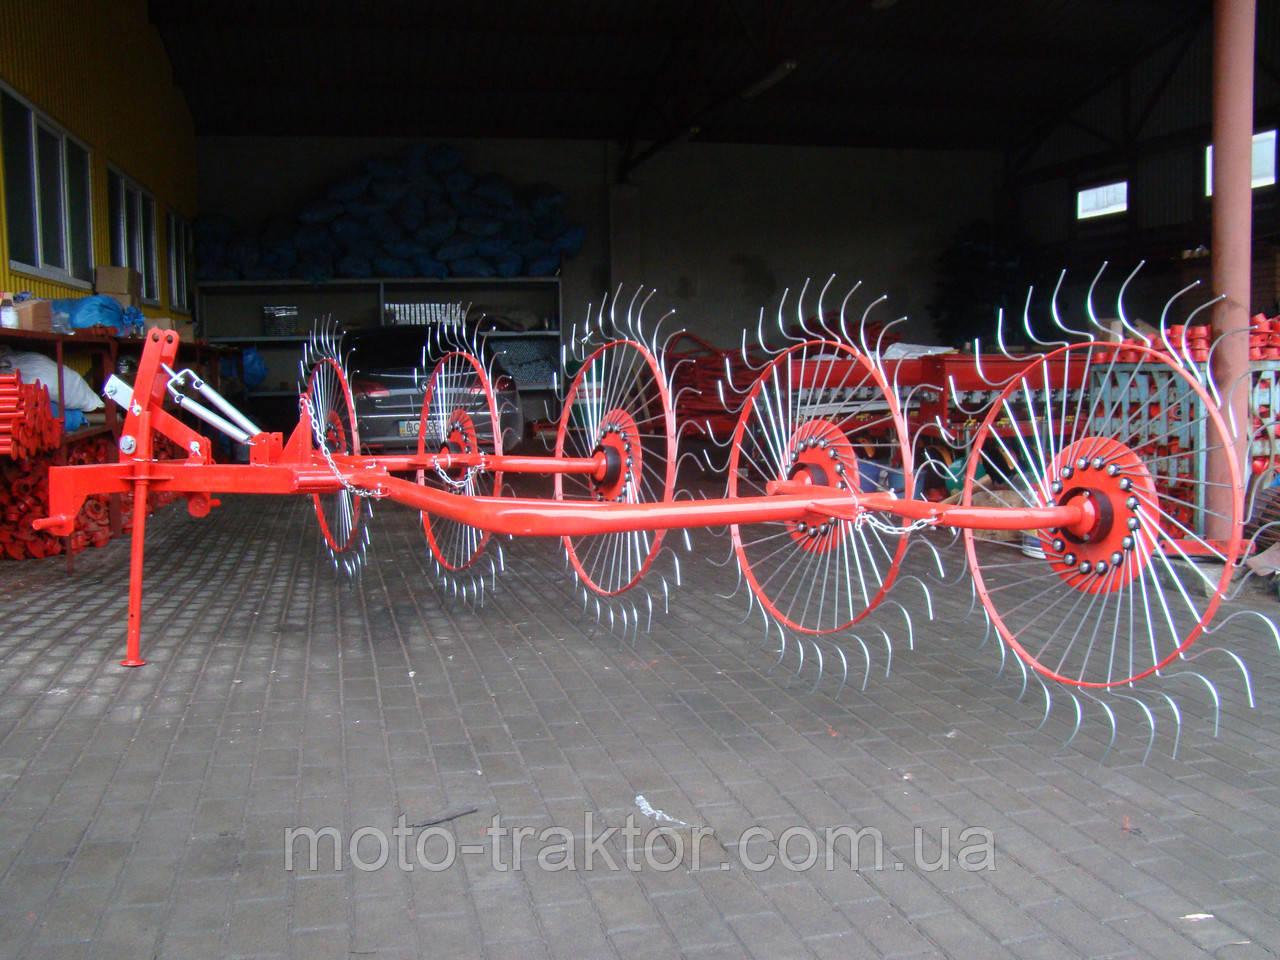 Грабли ворошилки Wirax (Солнышко 5 колес) Польша